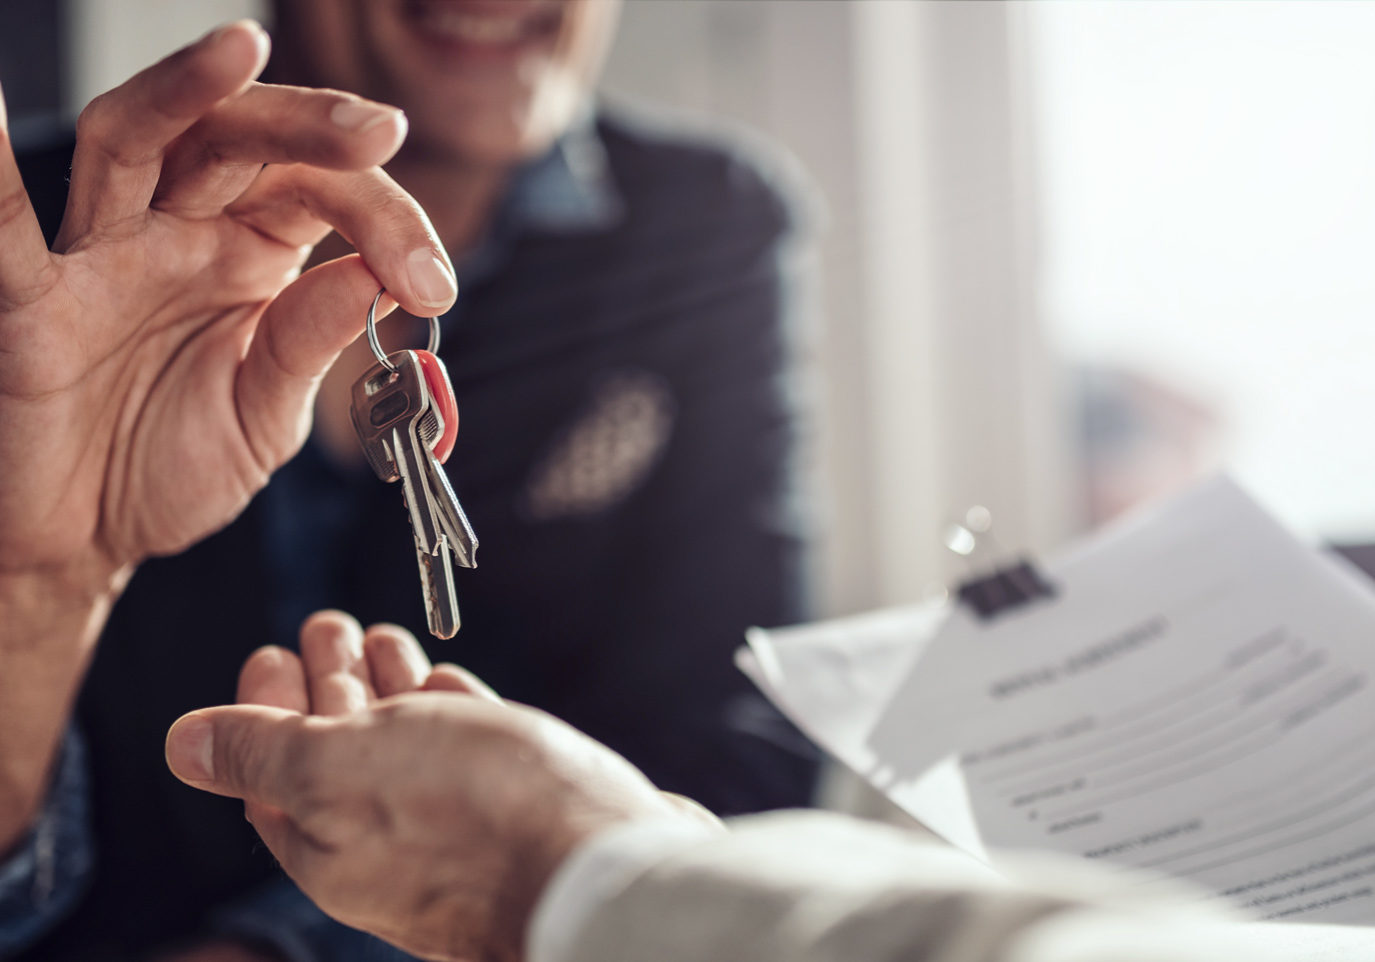 S&S Immo Gmbh - Immobilien verkaufen/vermieten